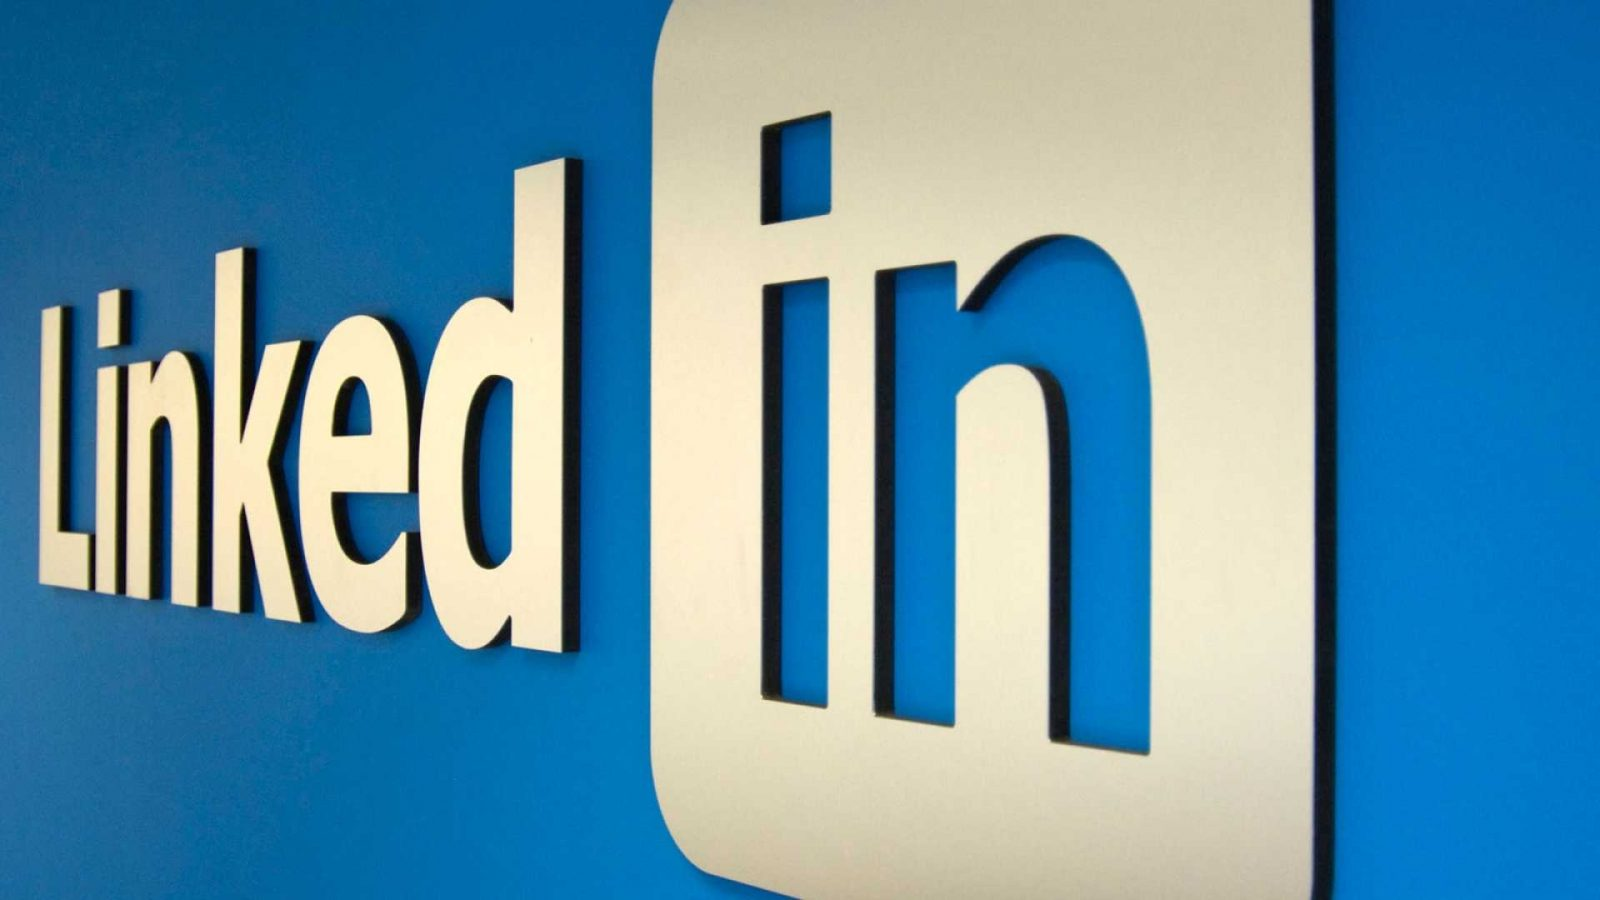 How to Cancel Linkedin Premium [3 Different Plans]